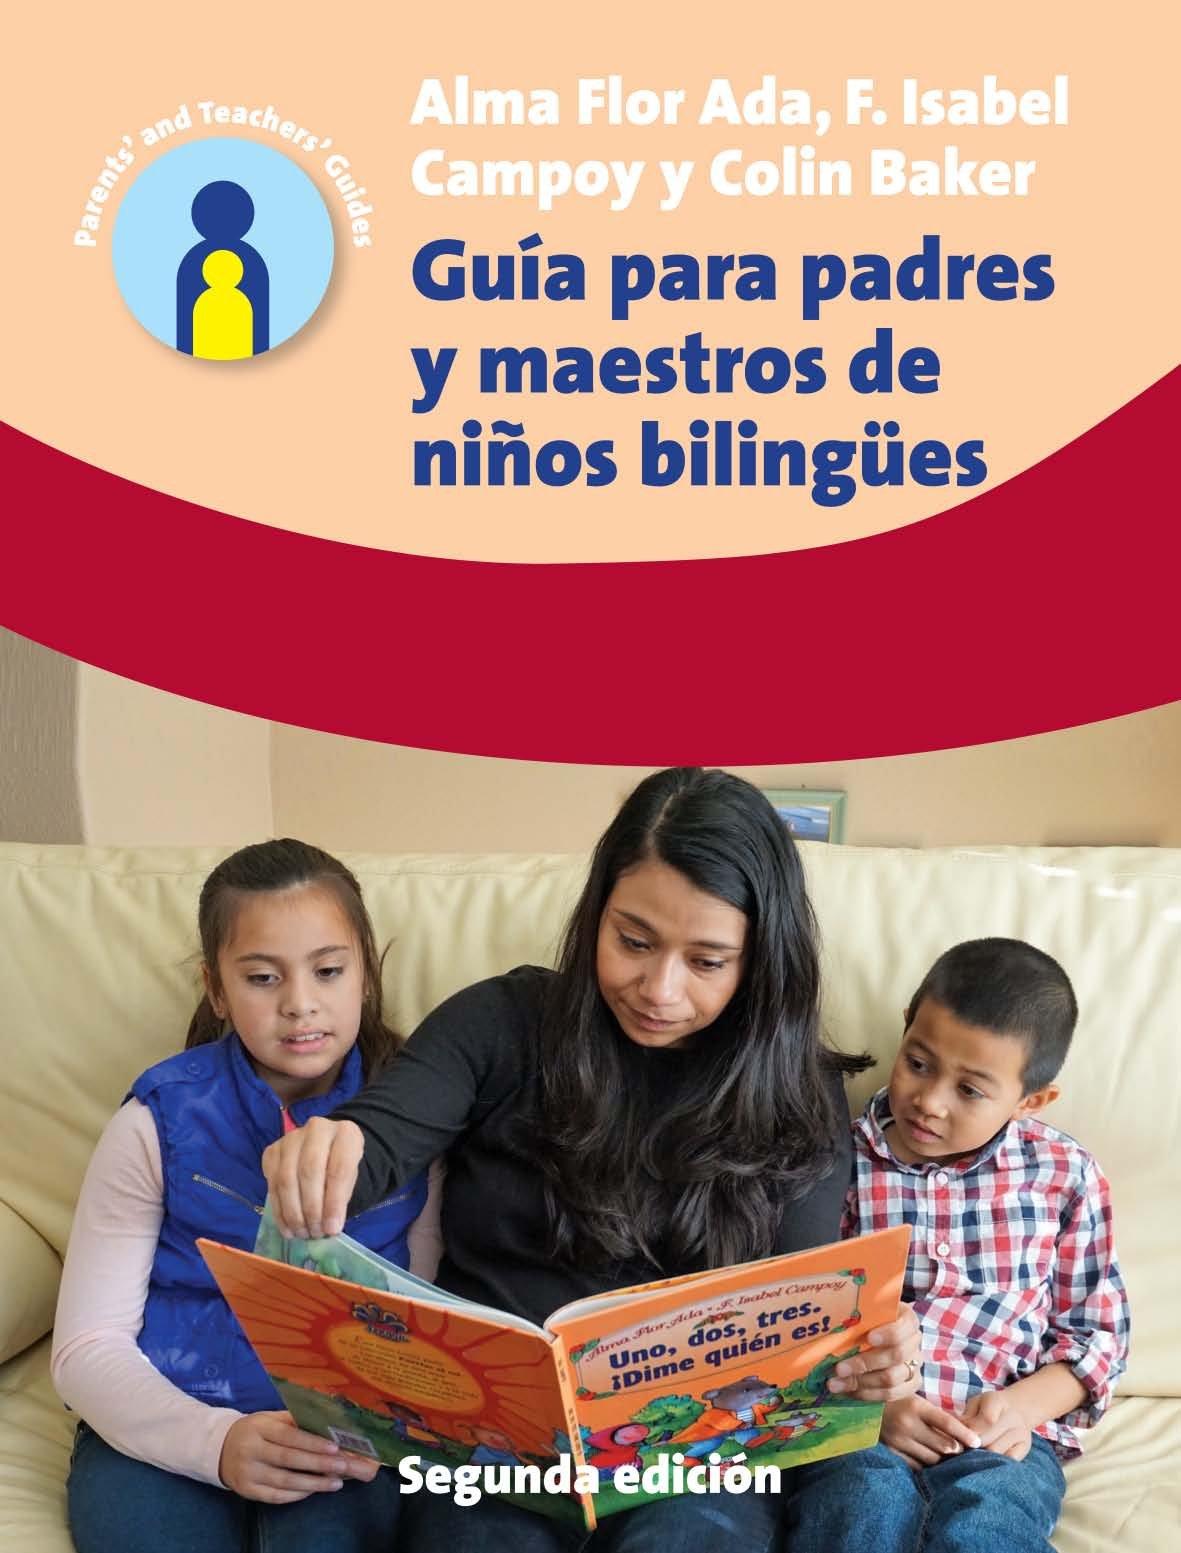 Guia Para Padres Y Maestros De Ninos Bilingues  2.a Edicion  Parents' And Teachers' Guides Band 24